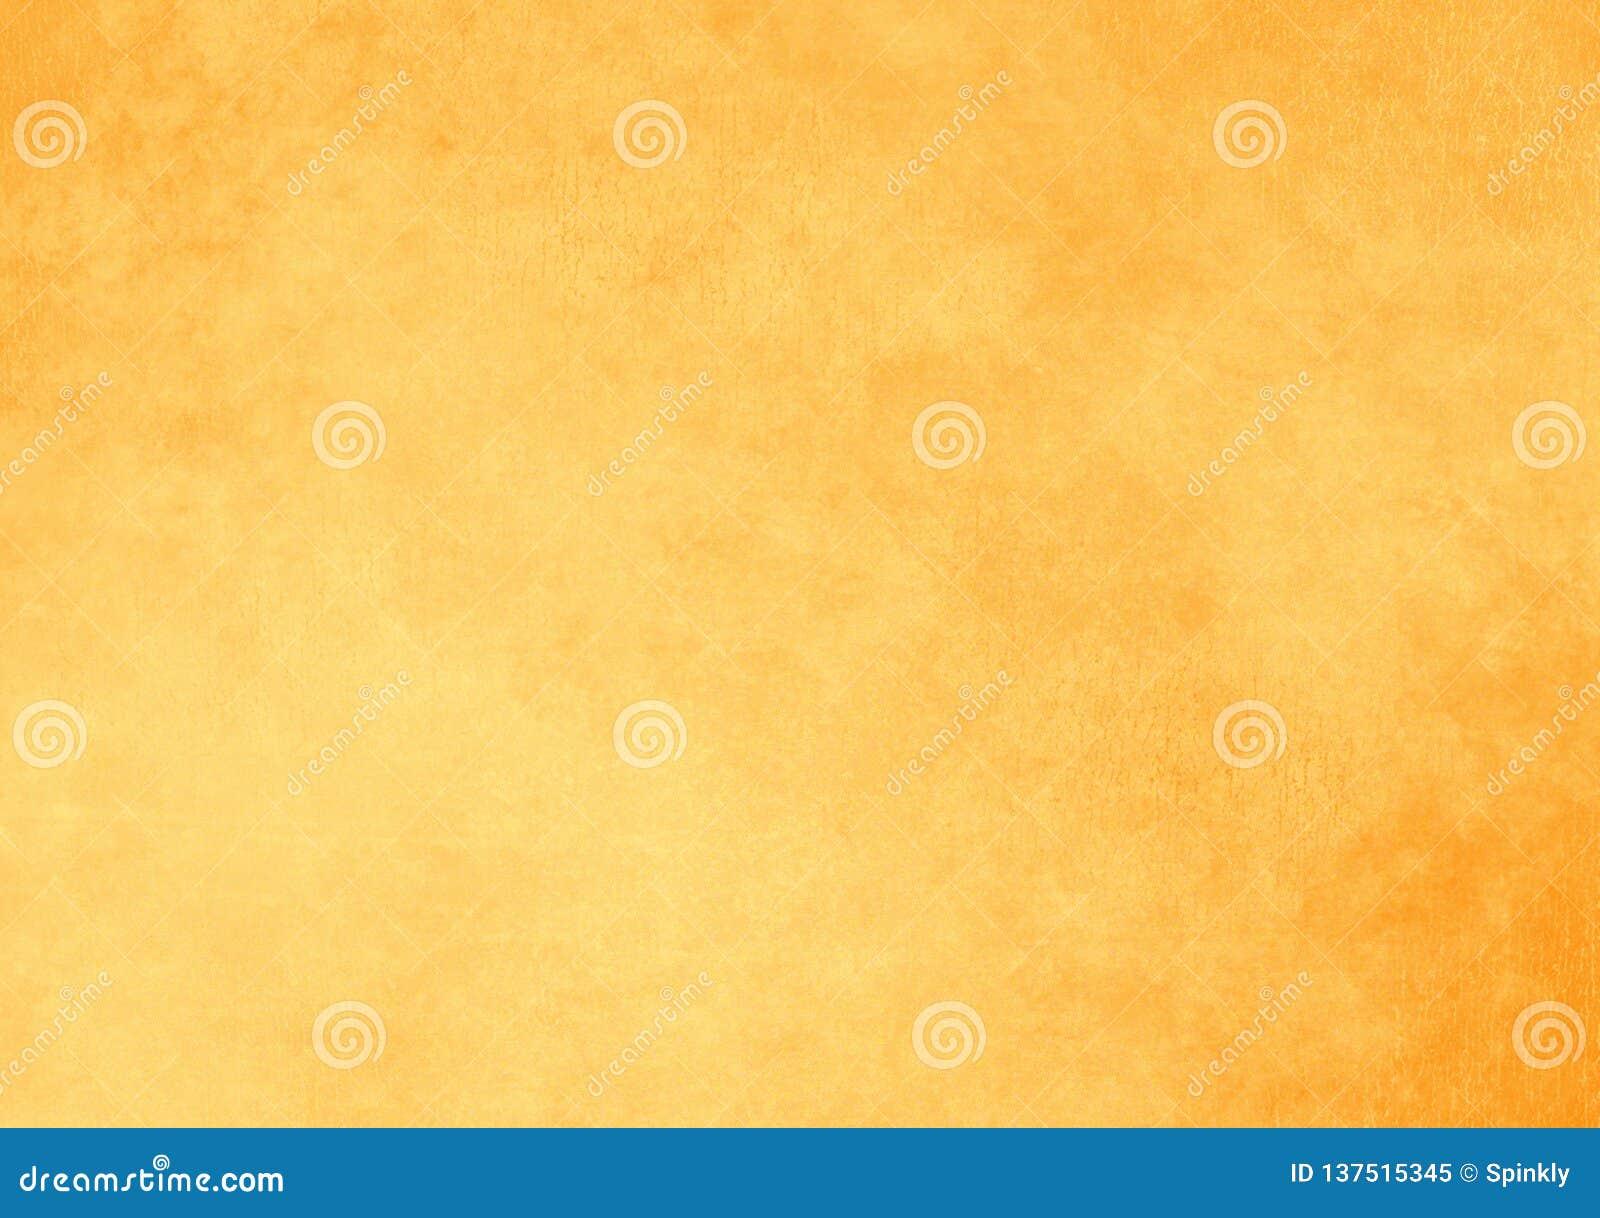 Yellow textured plain background wallpaper